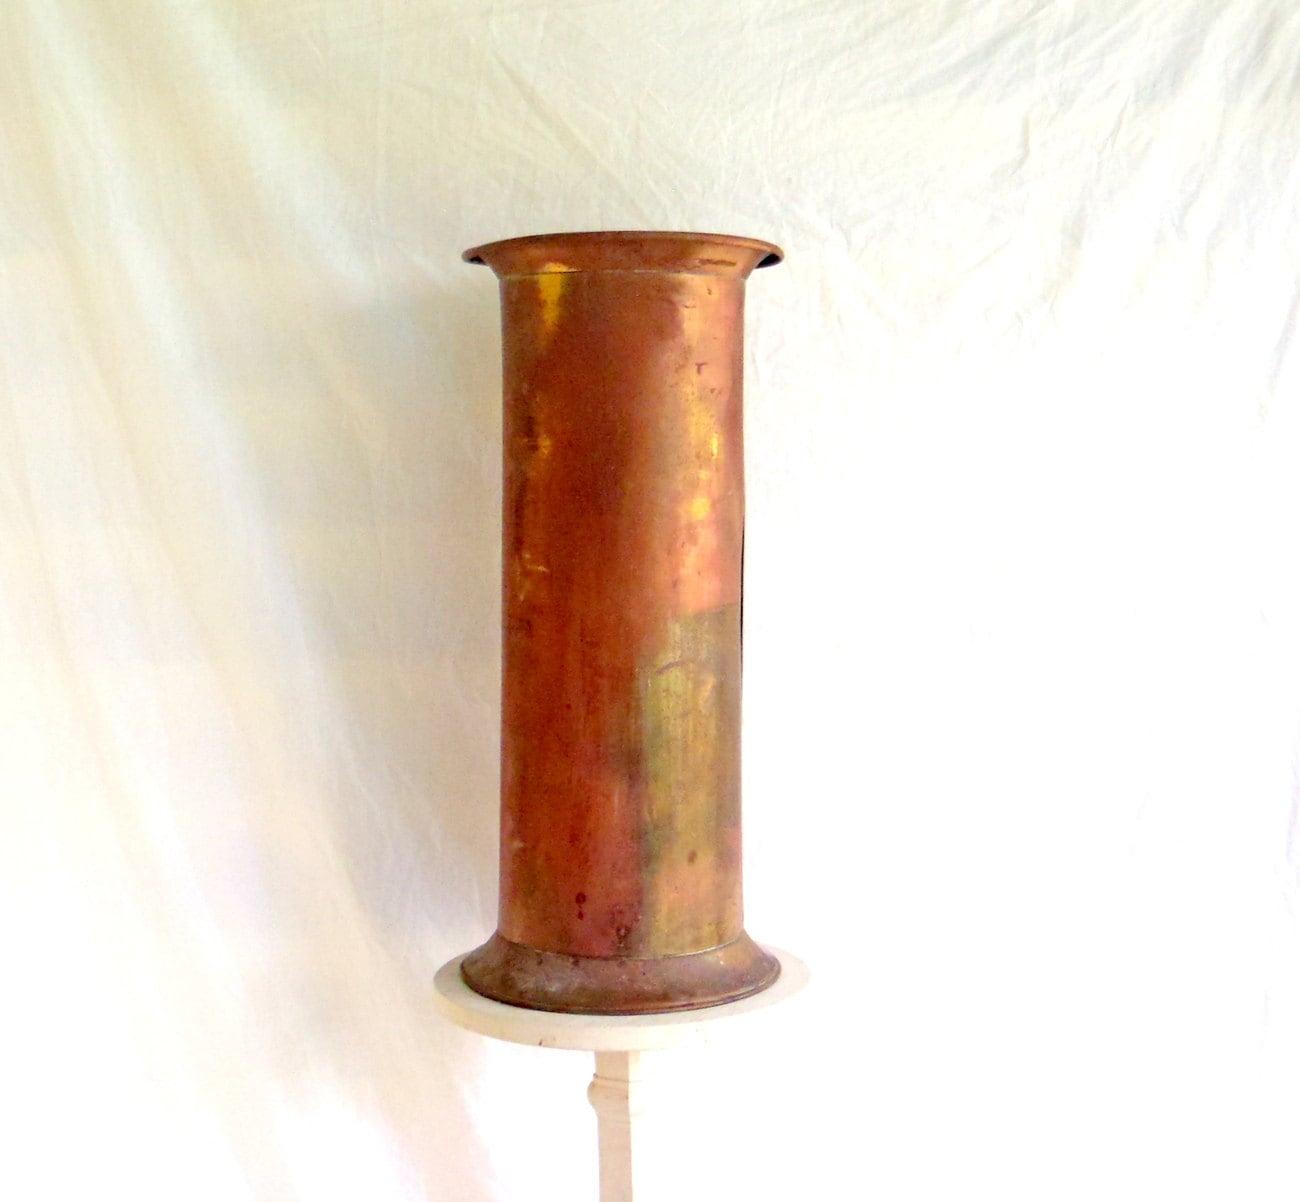 Brass Umbrella Stand Embossed: Umbrella Stand Copper Brass Antique Umbrella Stand